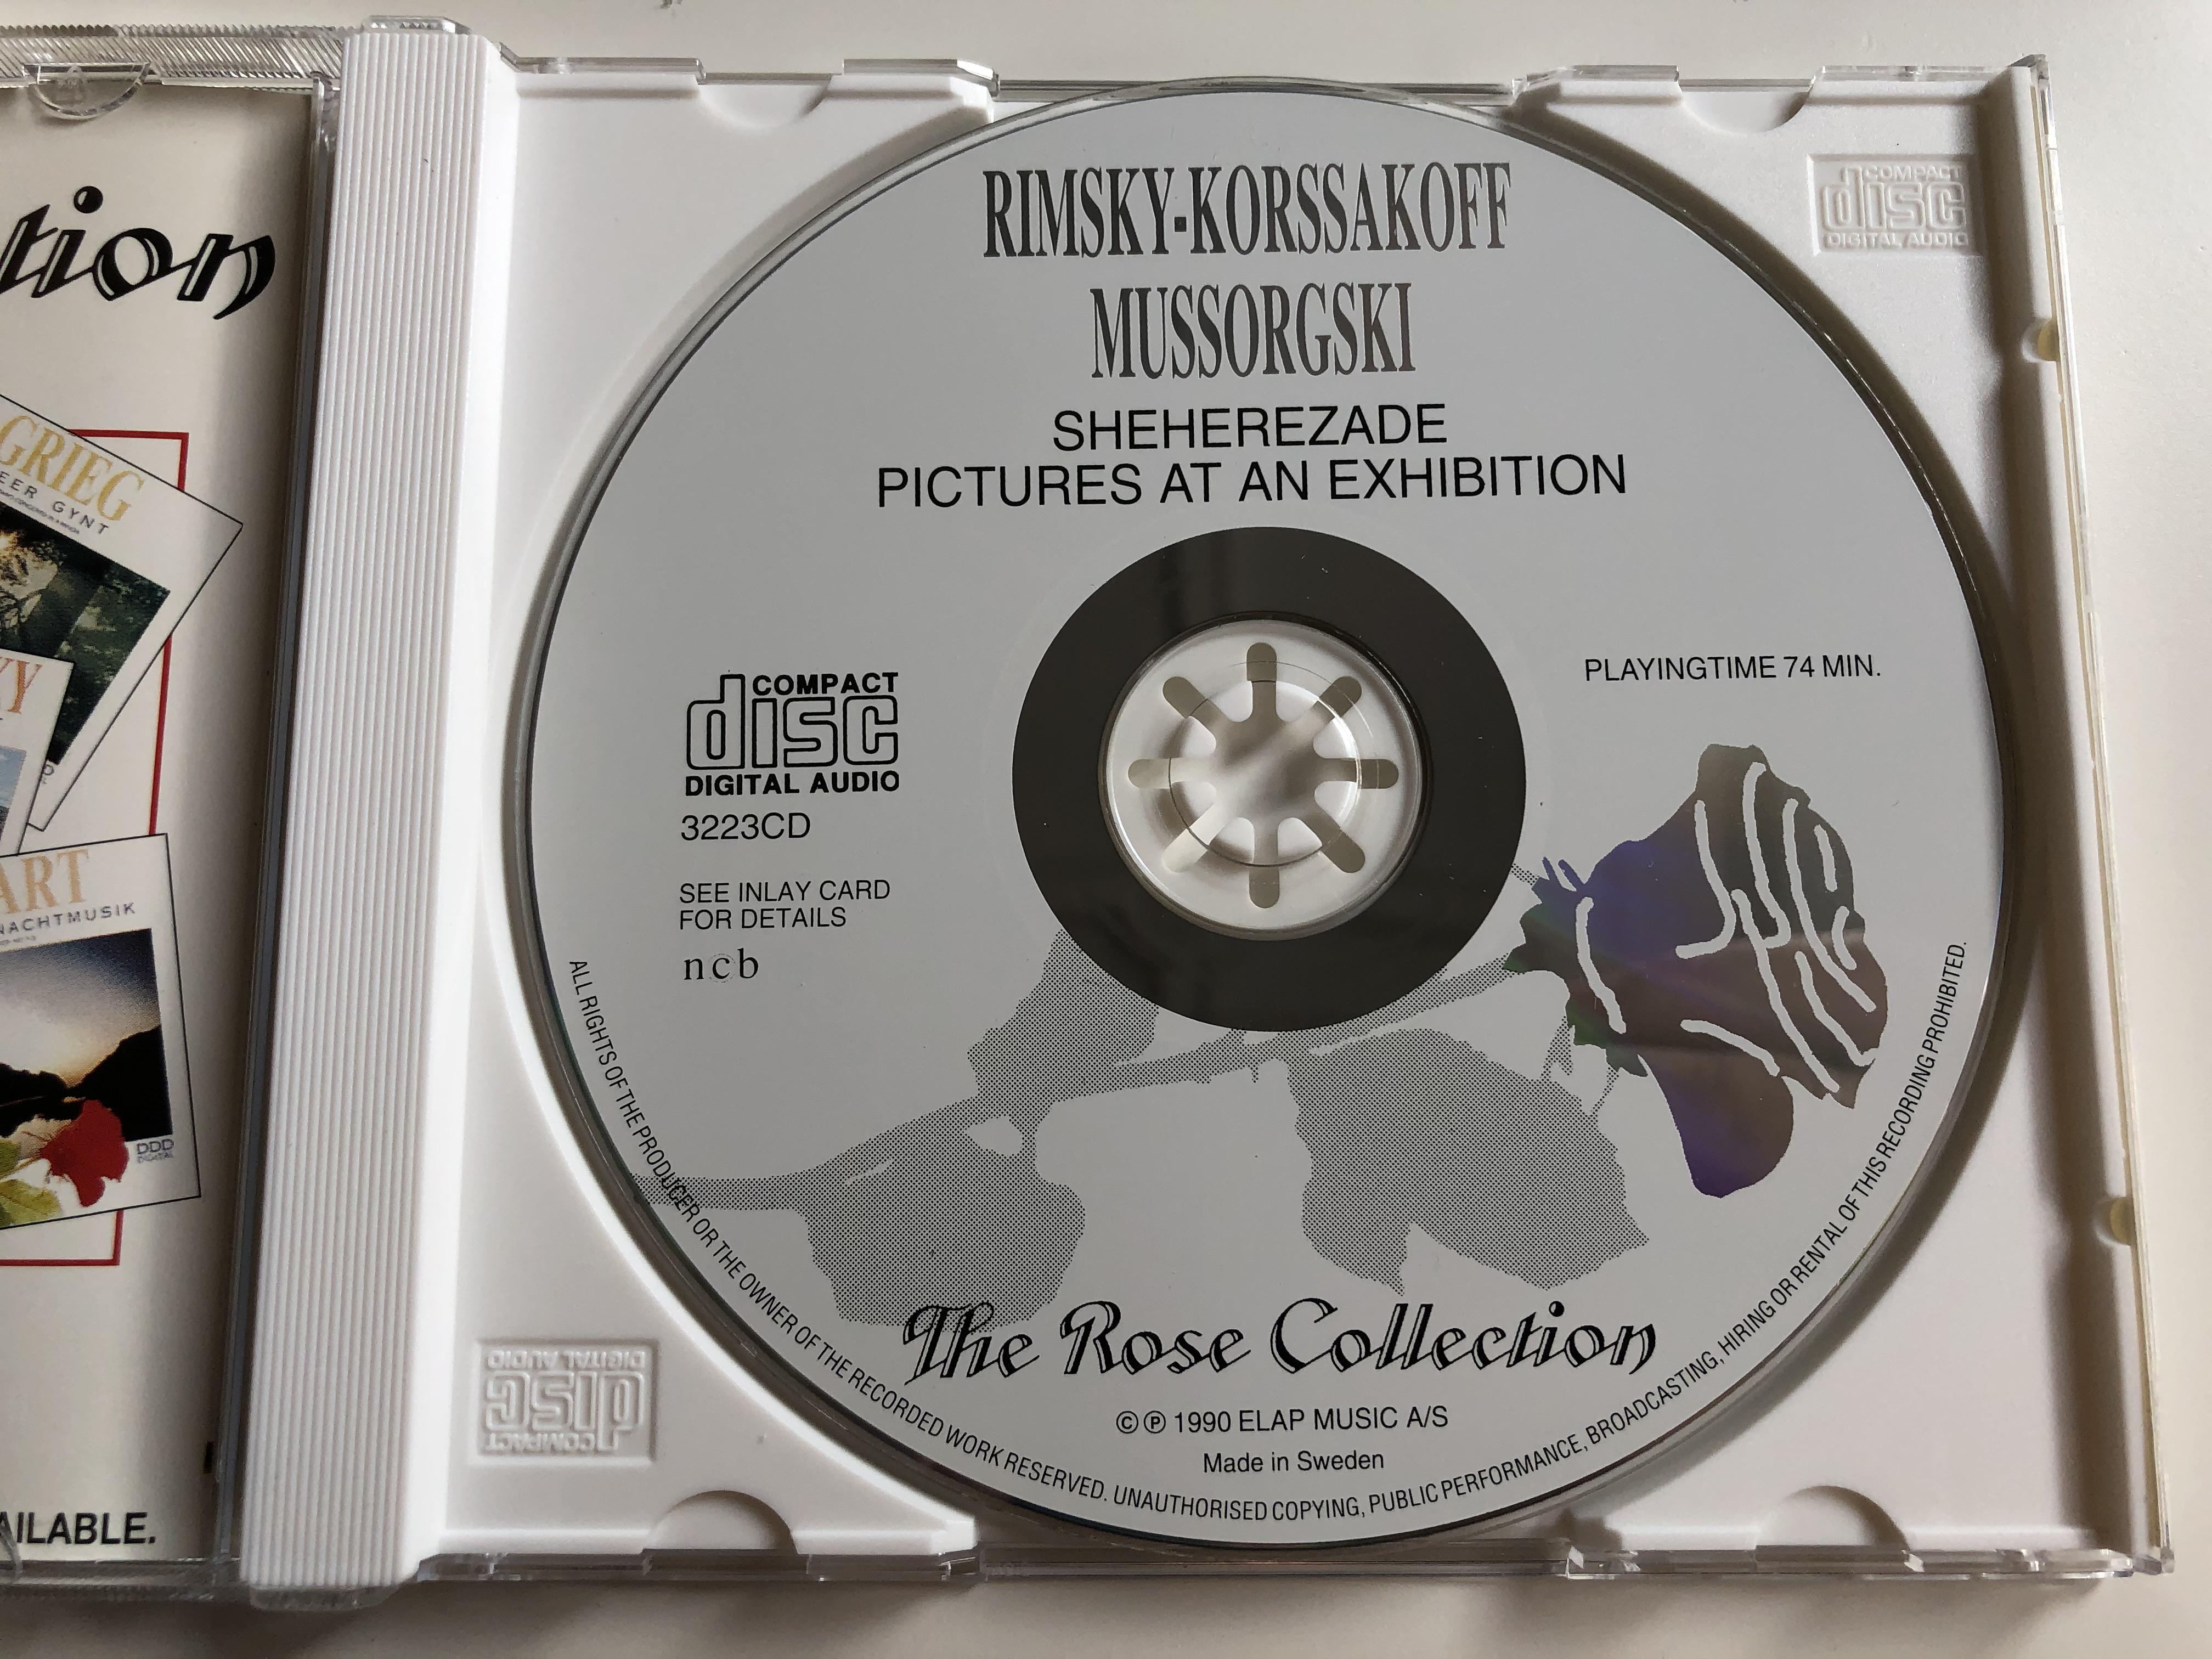 rimsky-korsakoff-mussorgski-sheherezade-pictures-at-an-exhibition-elap-audio-cd-1990-3223cd-2-.jpg